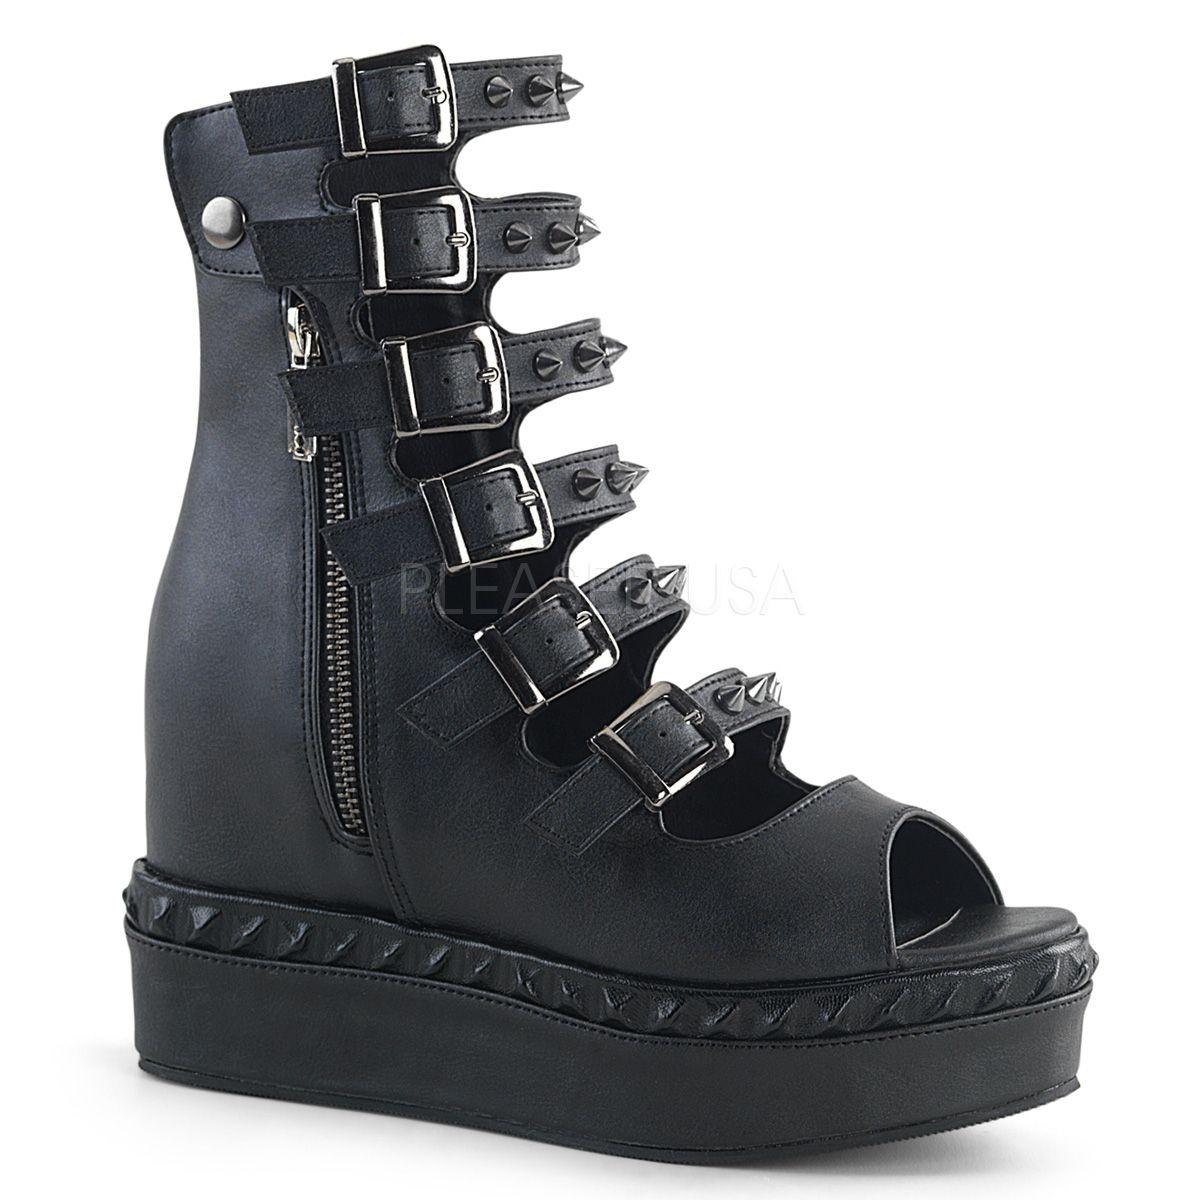 b9fee3fc3761a PL - Sklep z butami PLEASER - high heels, kozaczki, klapi, sandałki, buty  damskie - VENOM-110